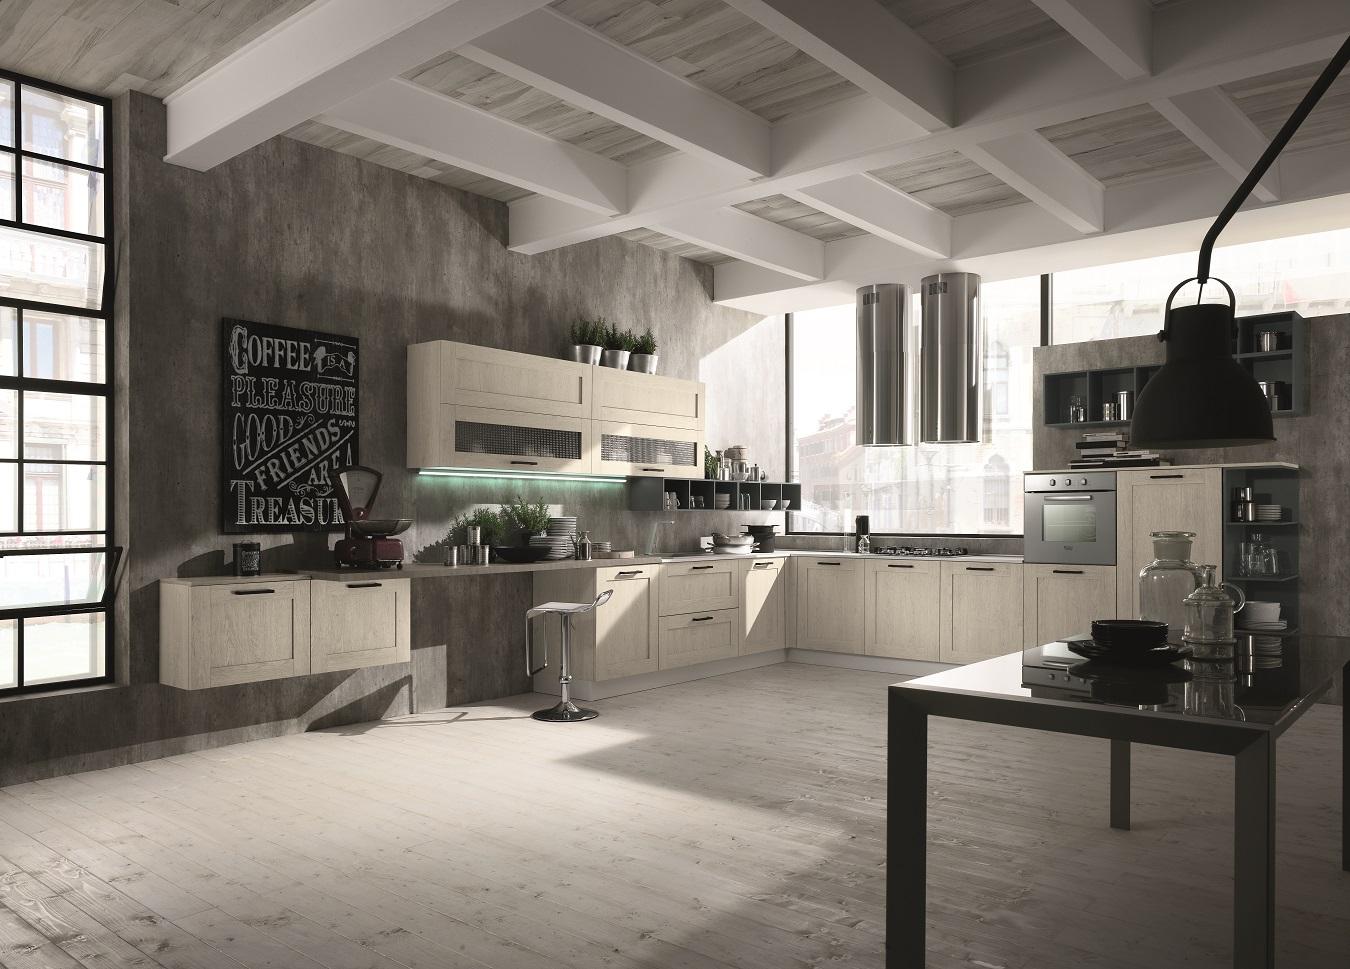 Cucina anta a telaio urban style arredook ardea arredamento casa cucine camere letti divani - Cucine urban style ...